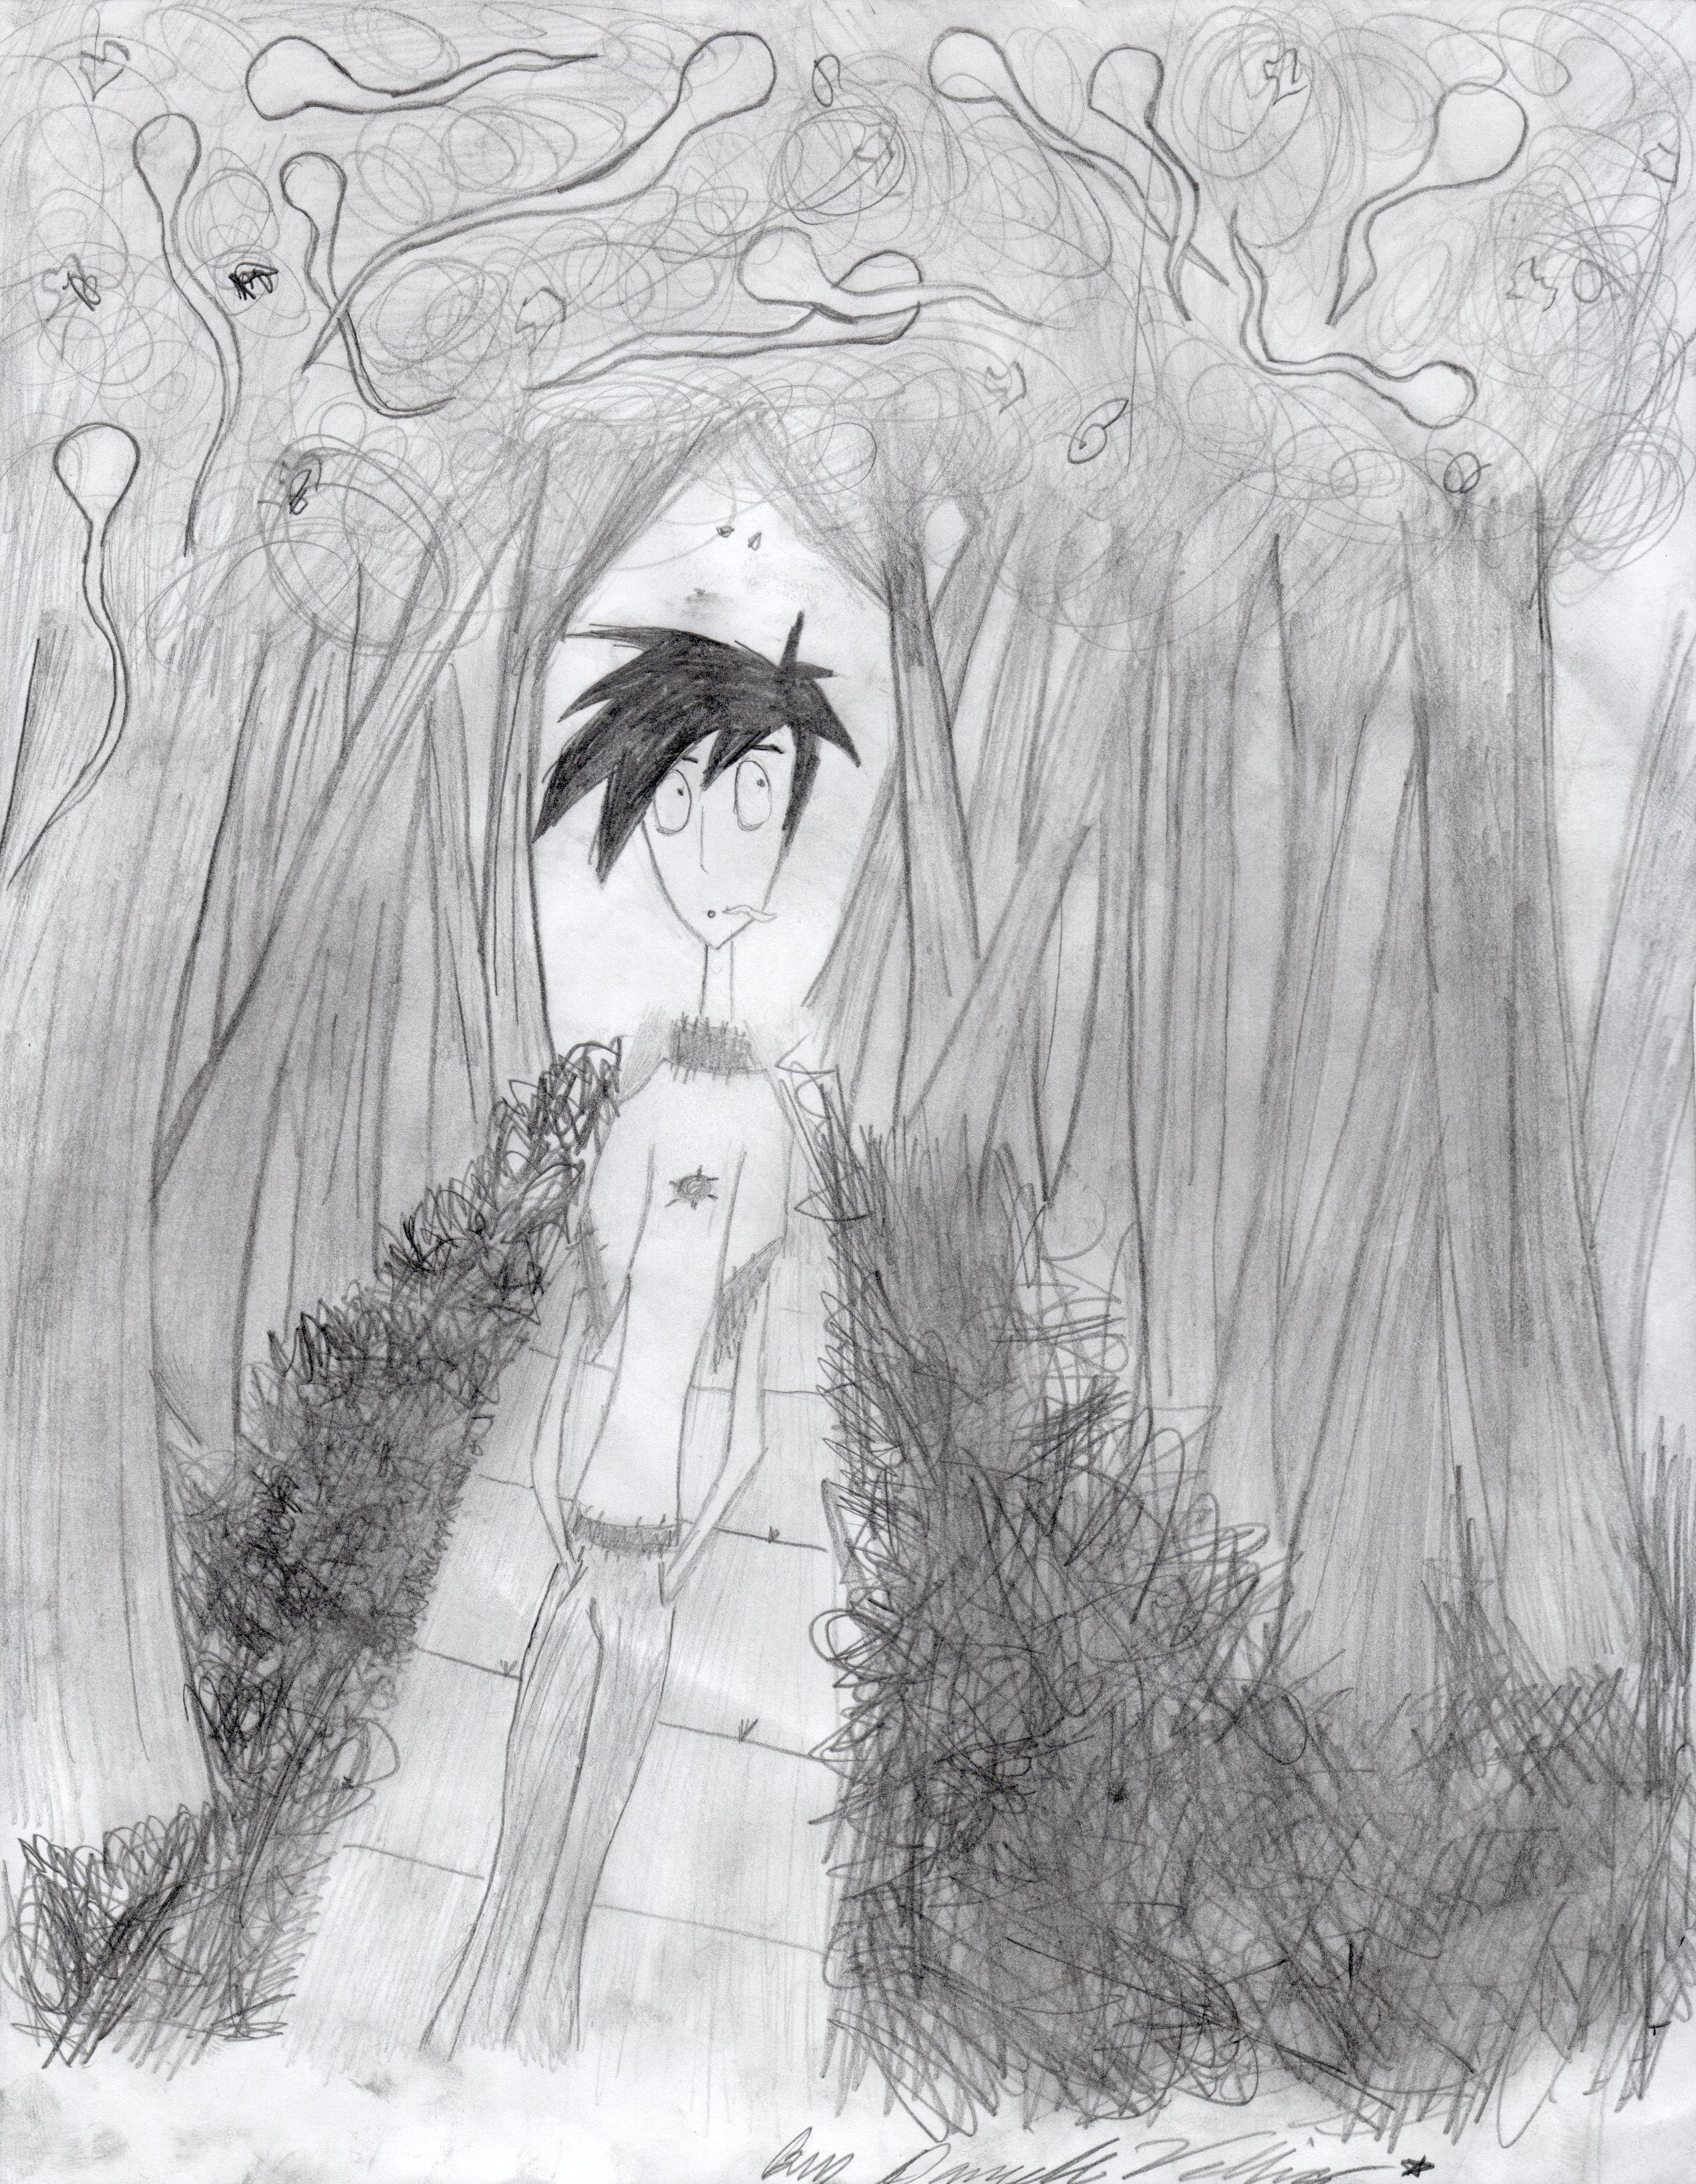 Danny Phantom Tim Burton style by abitofdrama